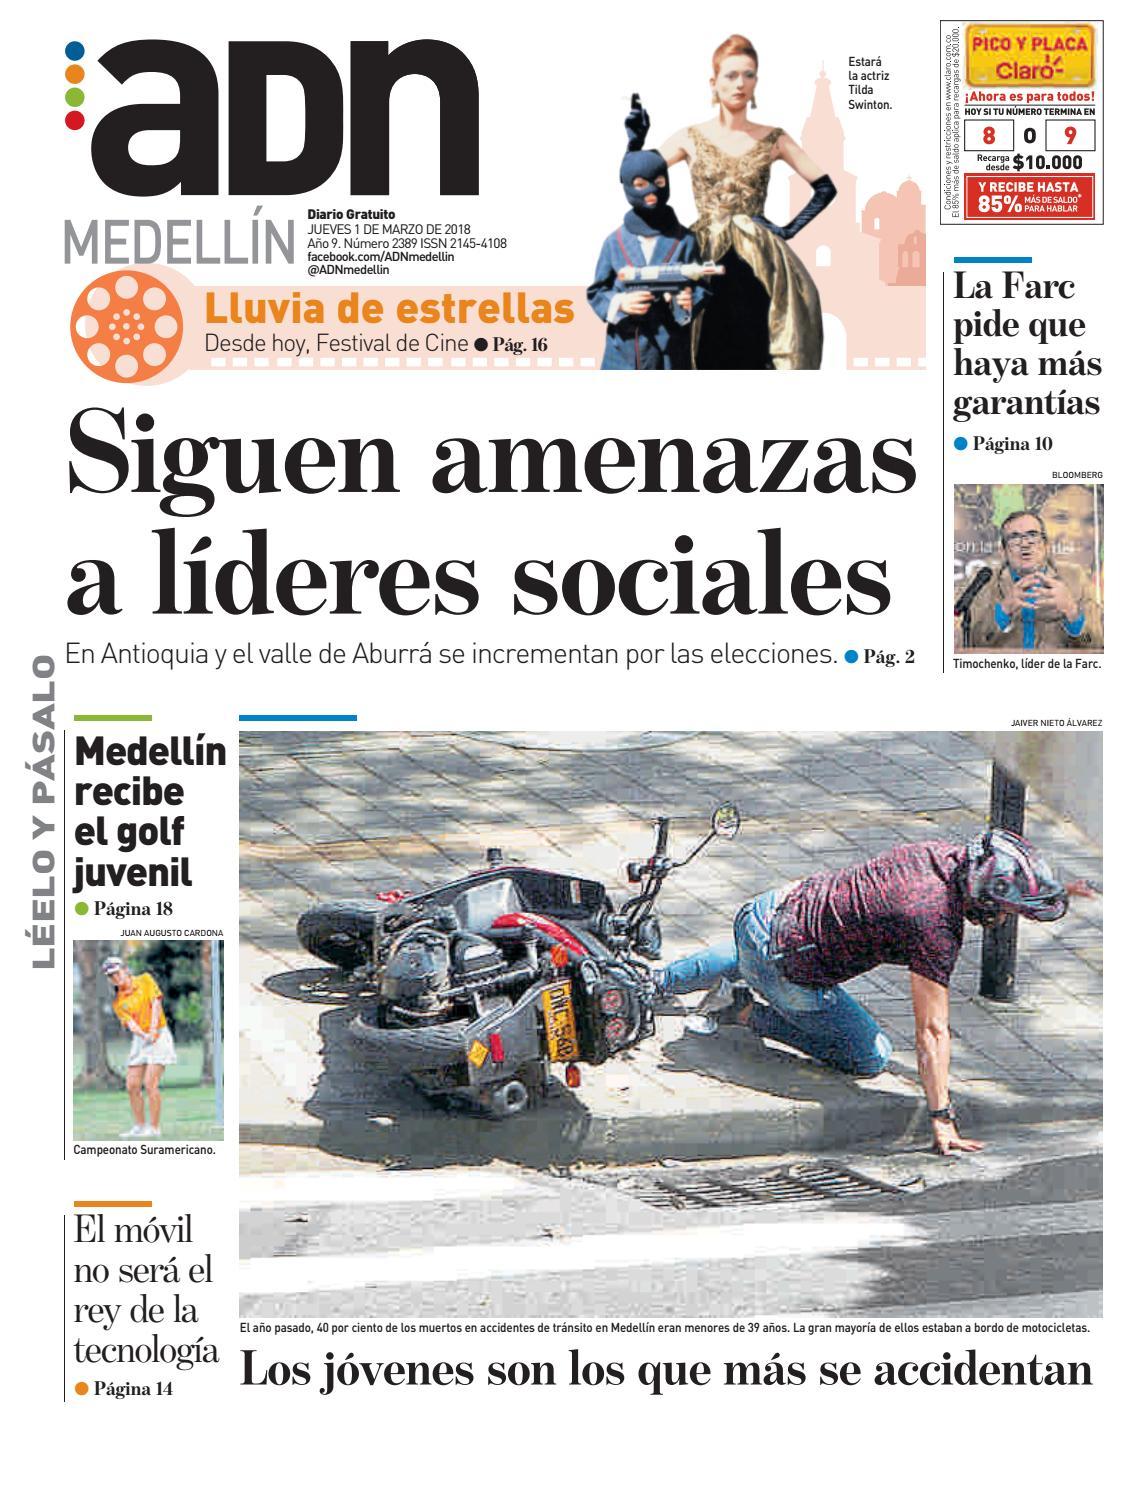 1 de marzo Medellín by diarioadn.co - issuu